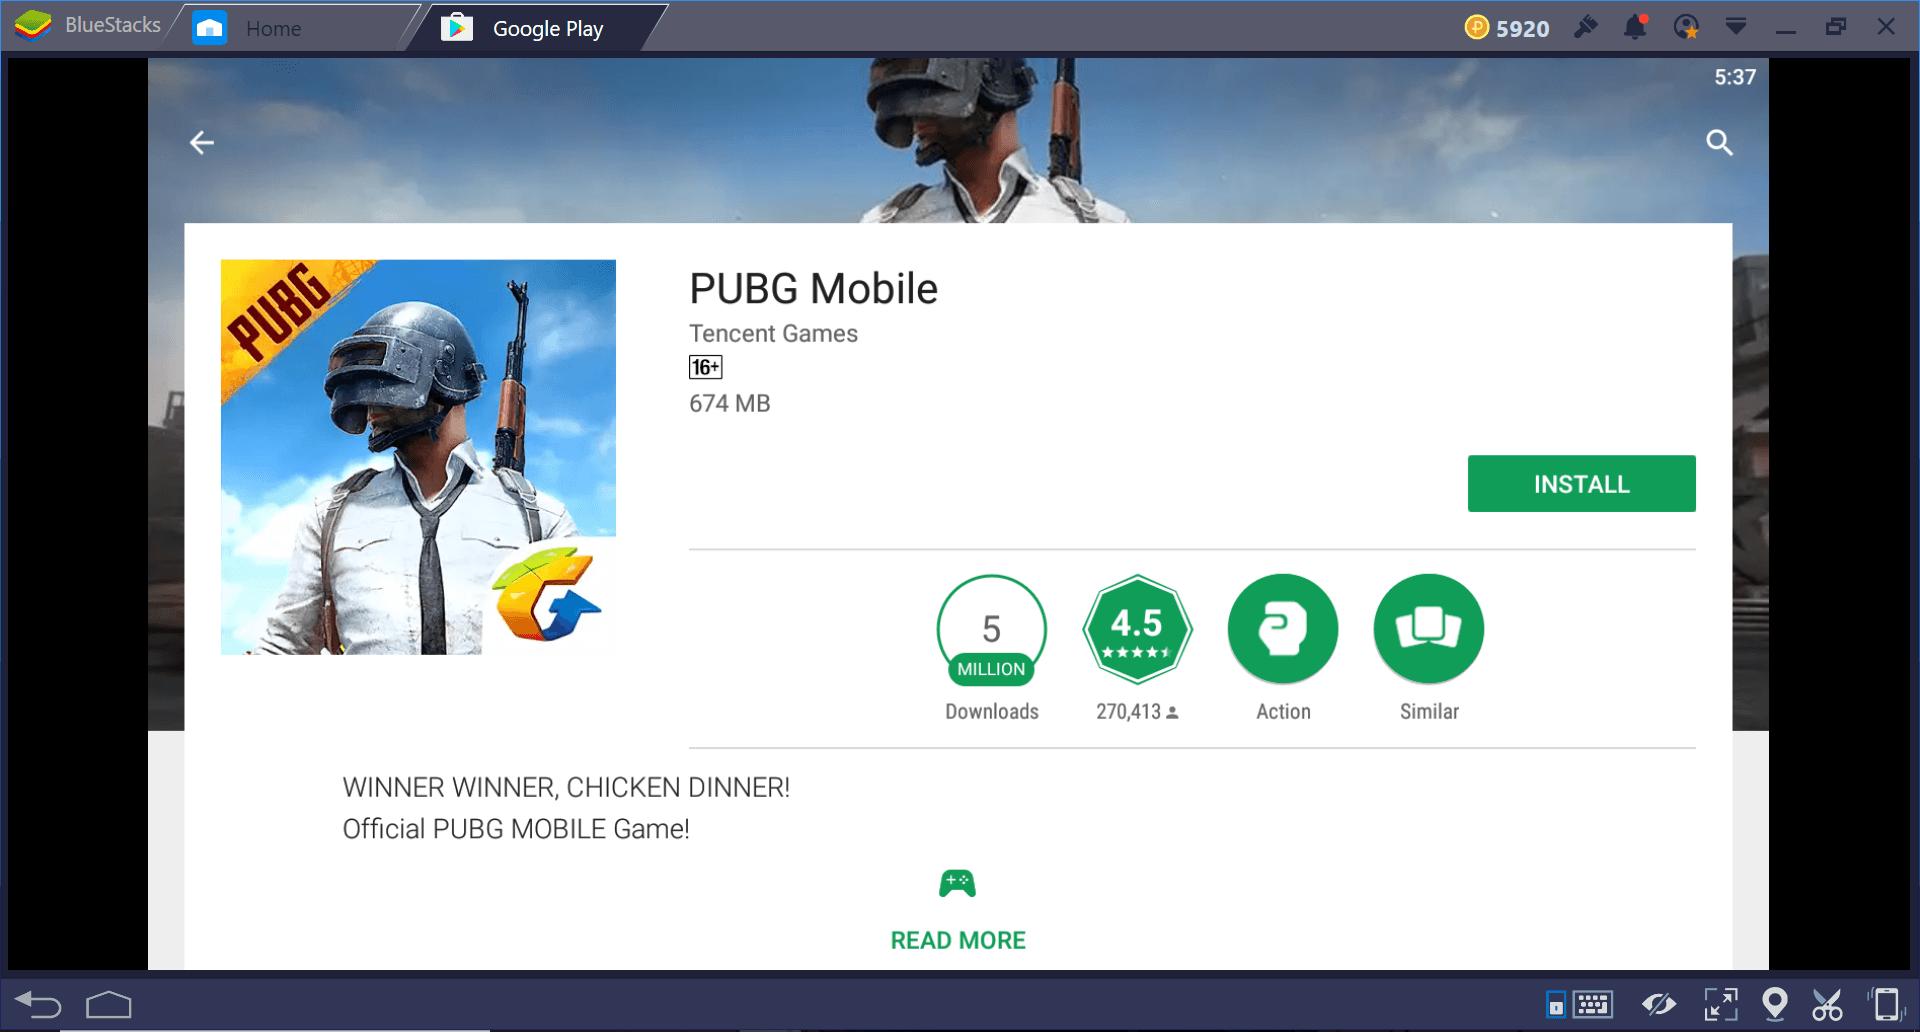 PUBG International Release Img 4